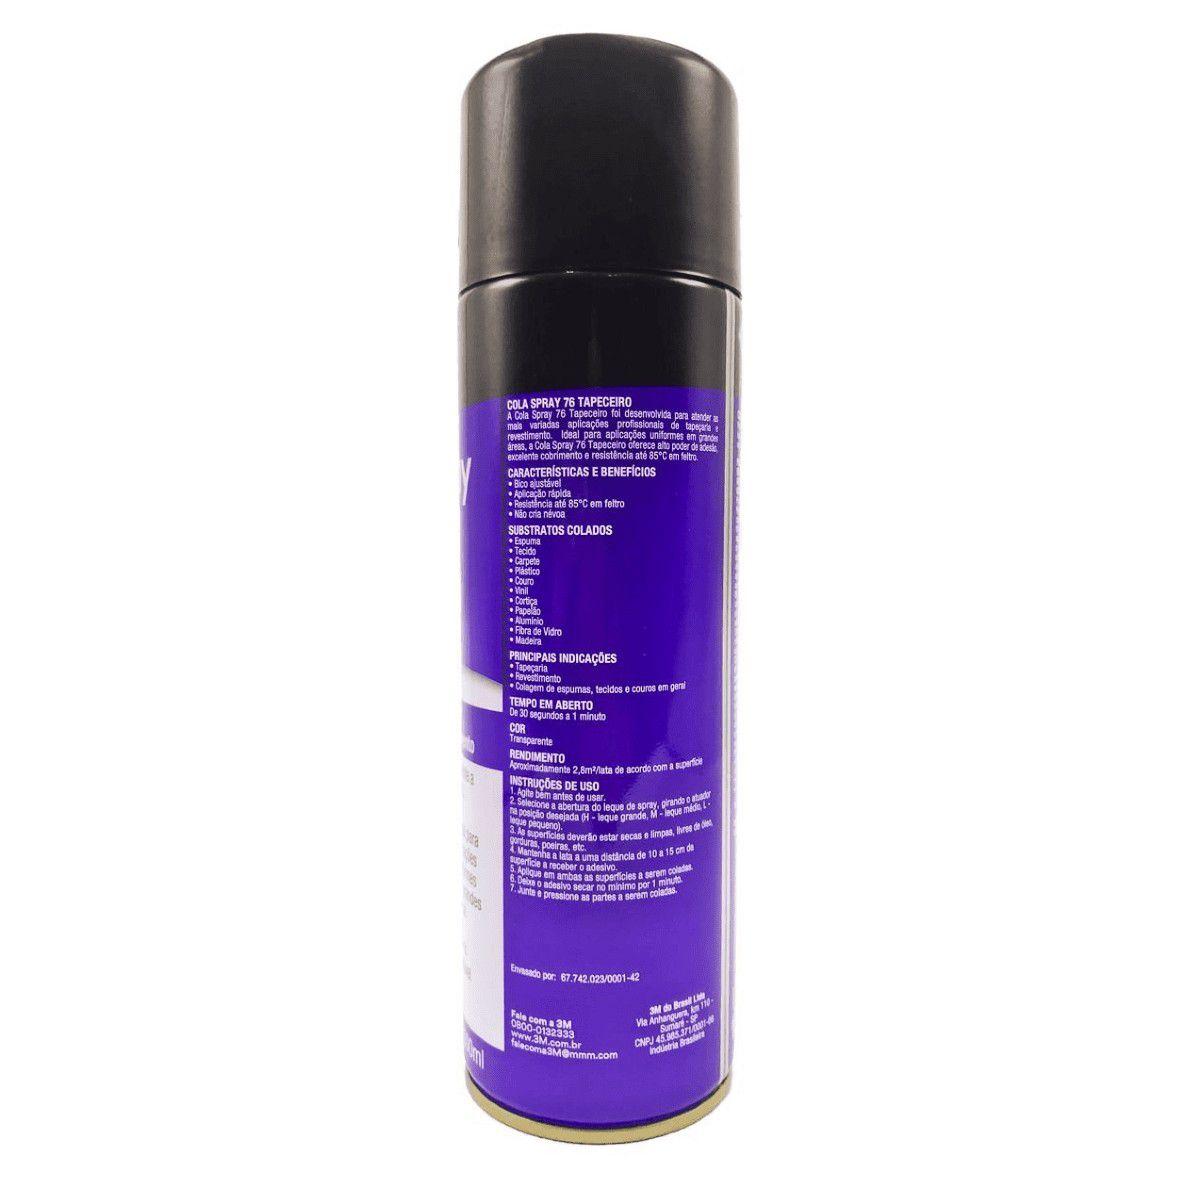 Adesivo Cola Spray 3m 76 Forro Plastico Tapeceiro ( 2 Peças)